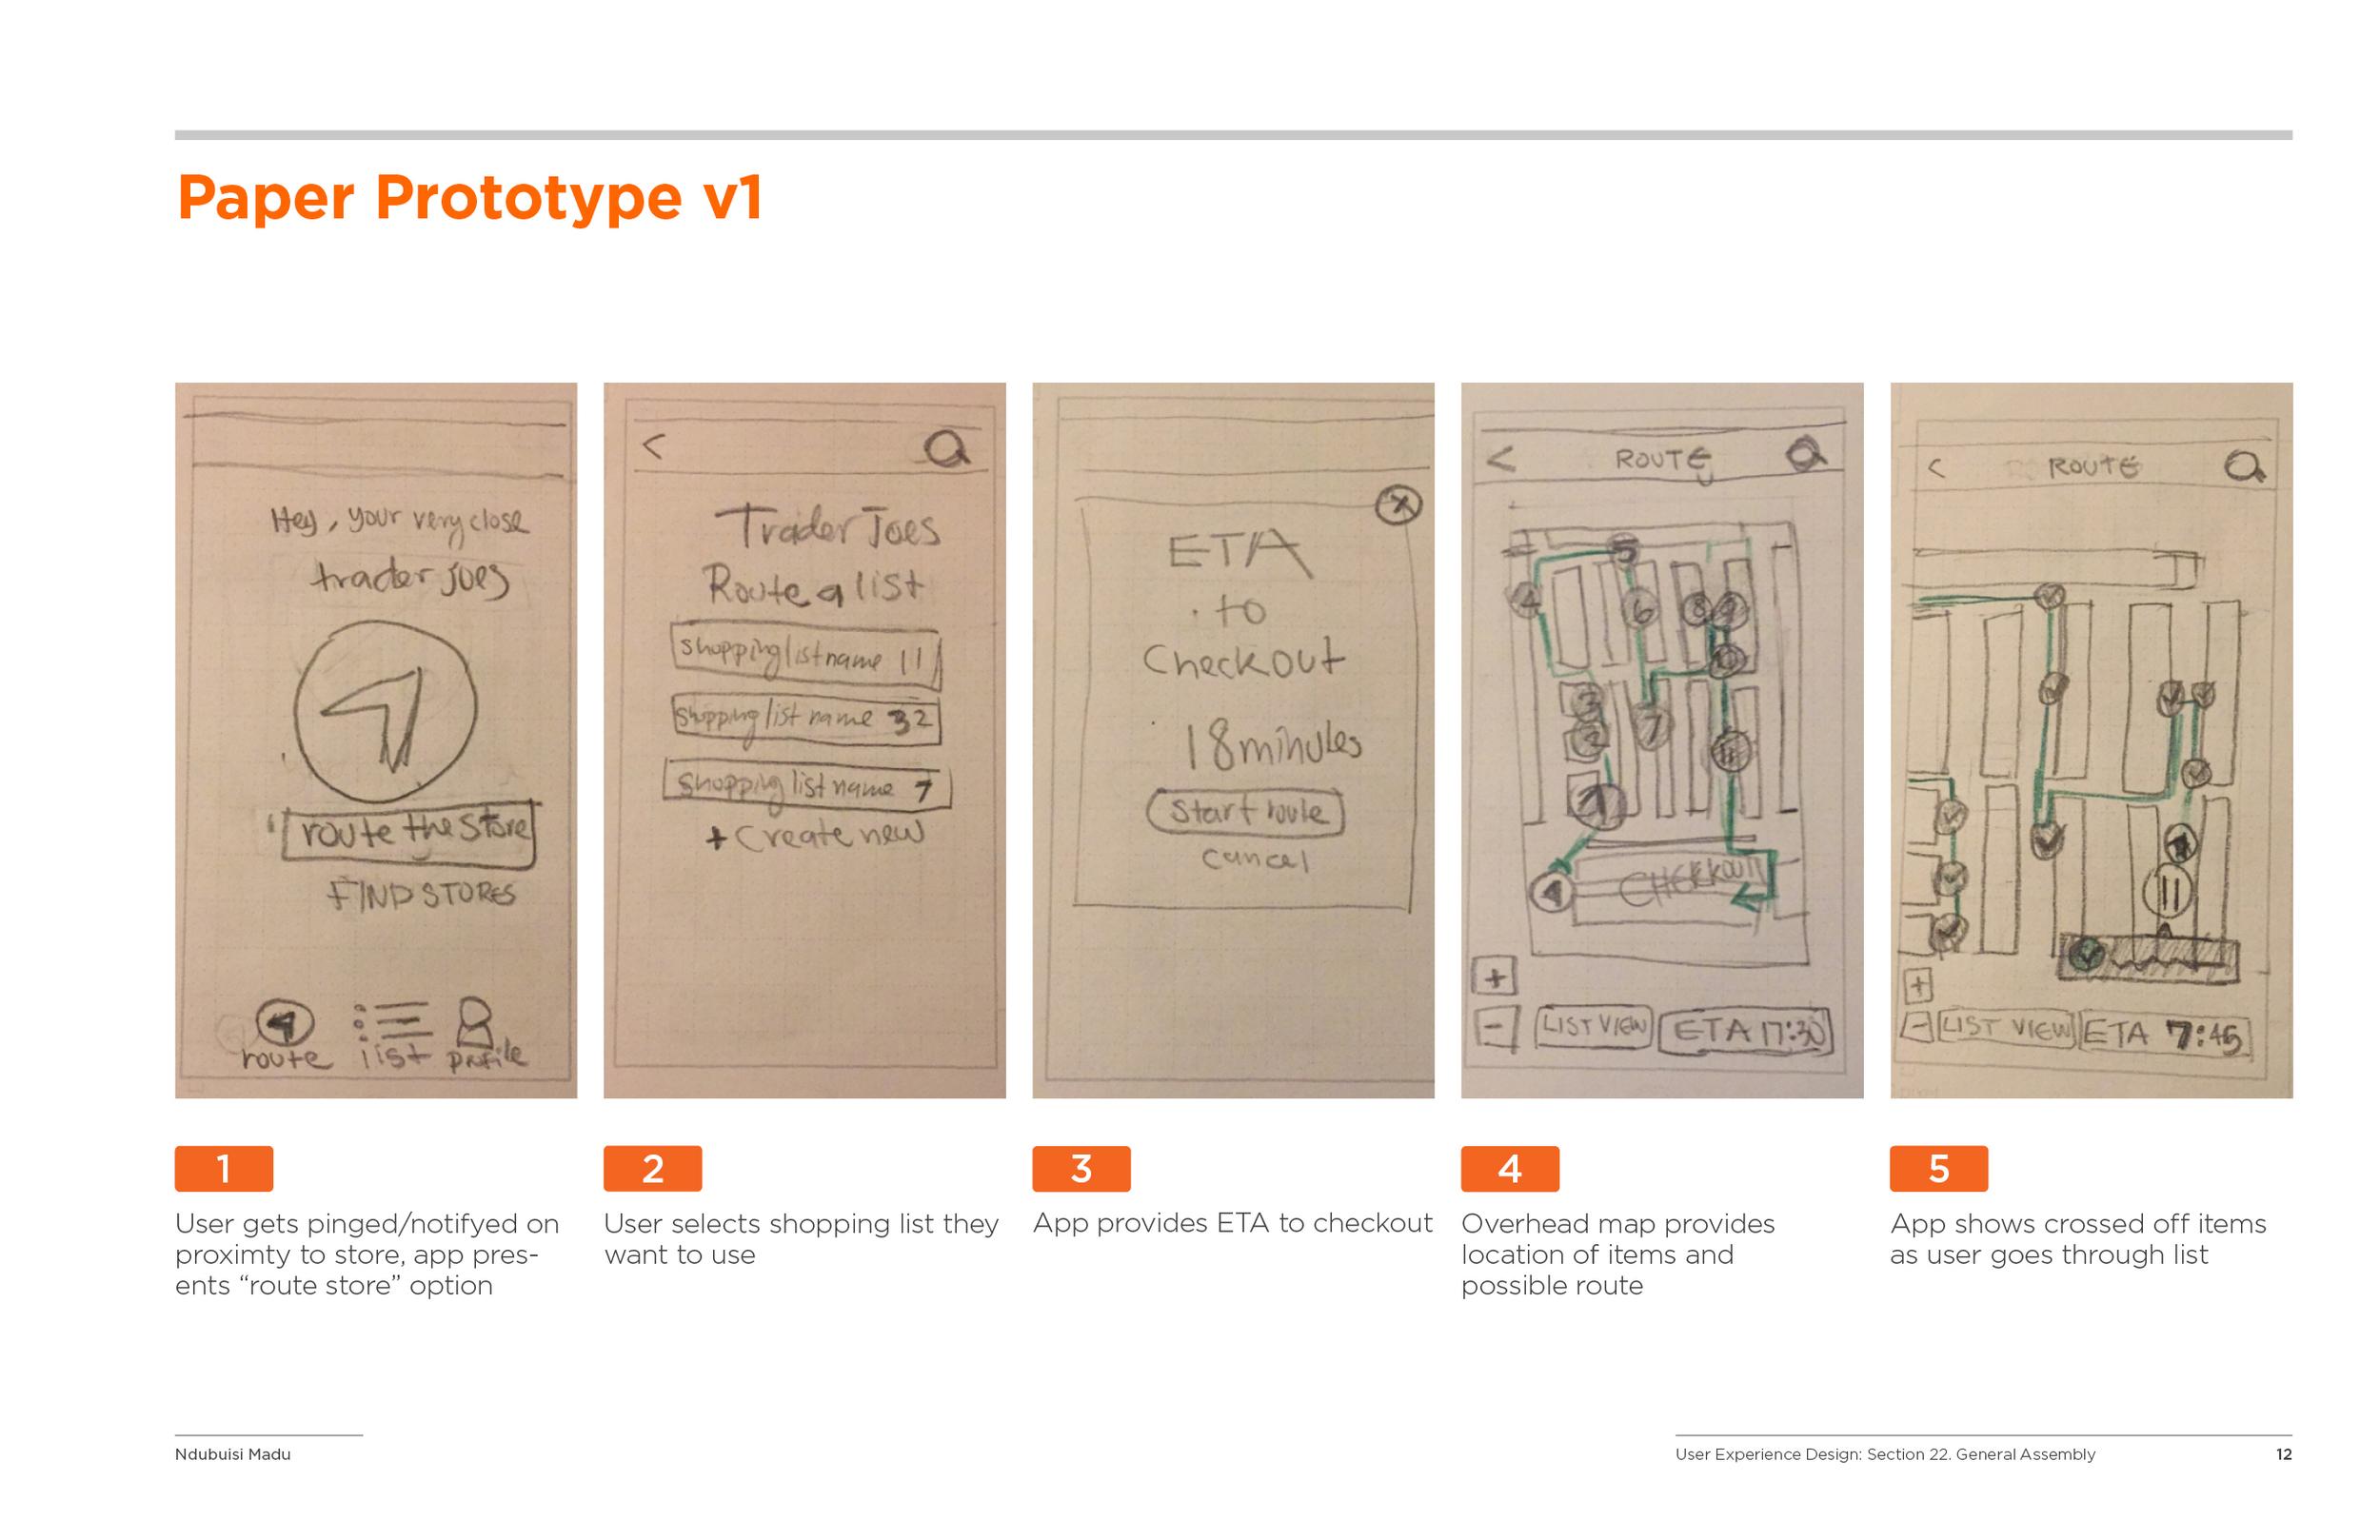 UXD22_NduMadu_Final_Presentation_Splash12.jpg